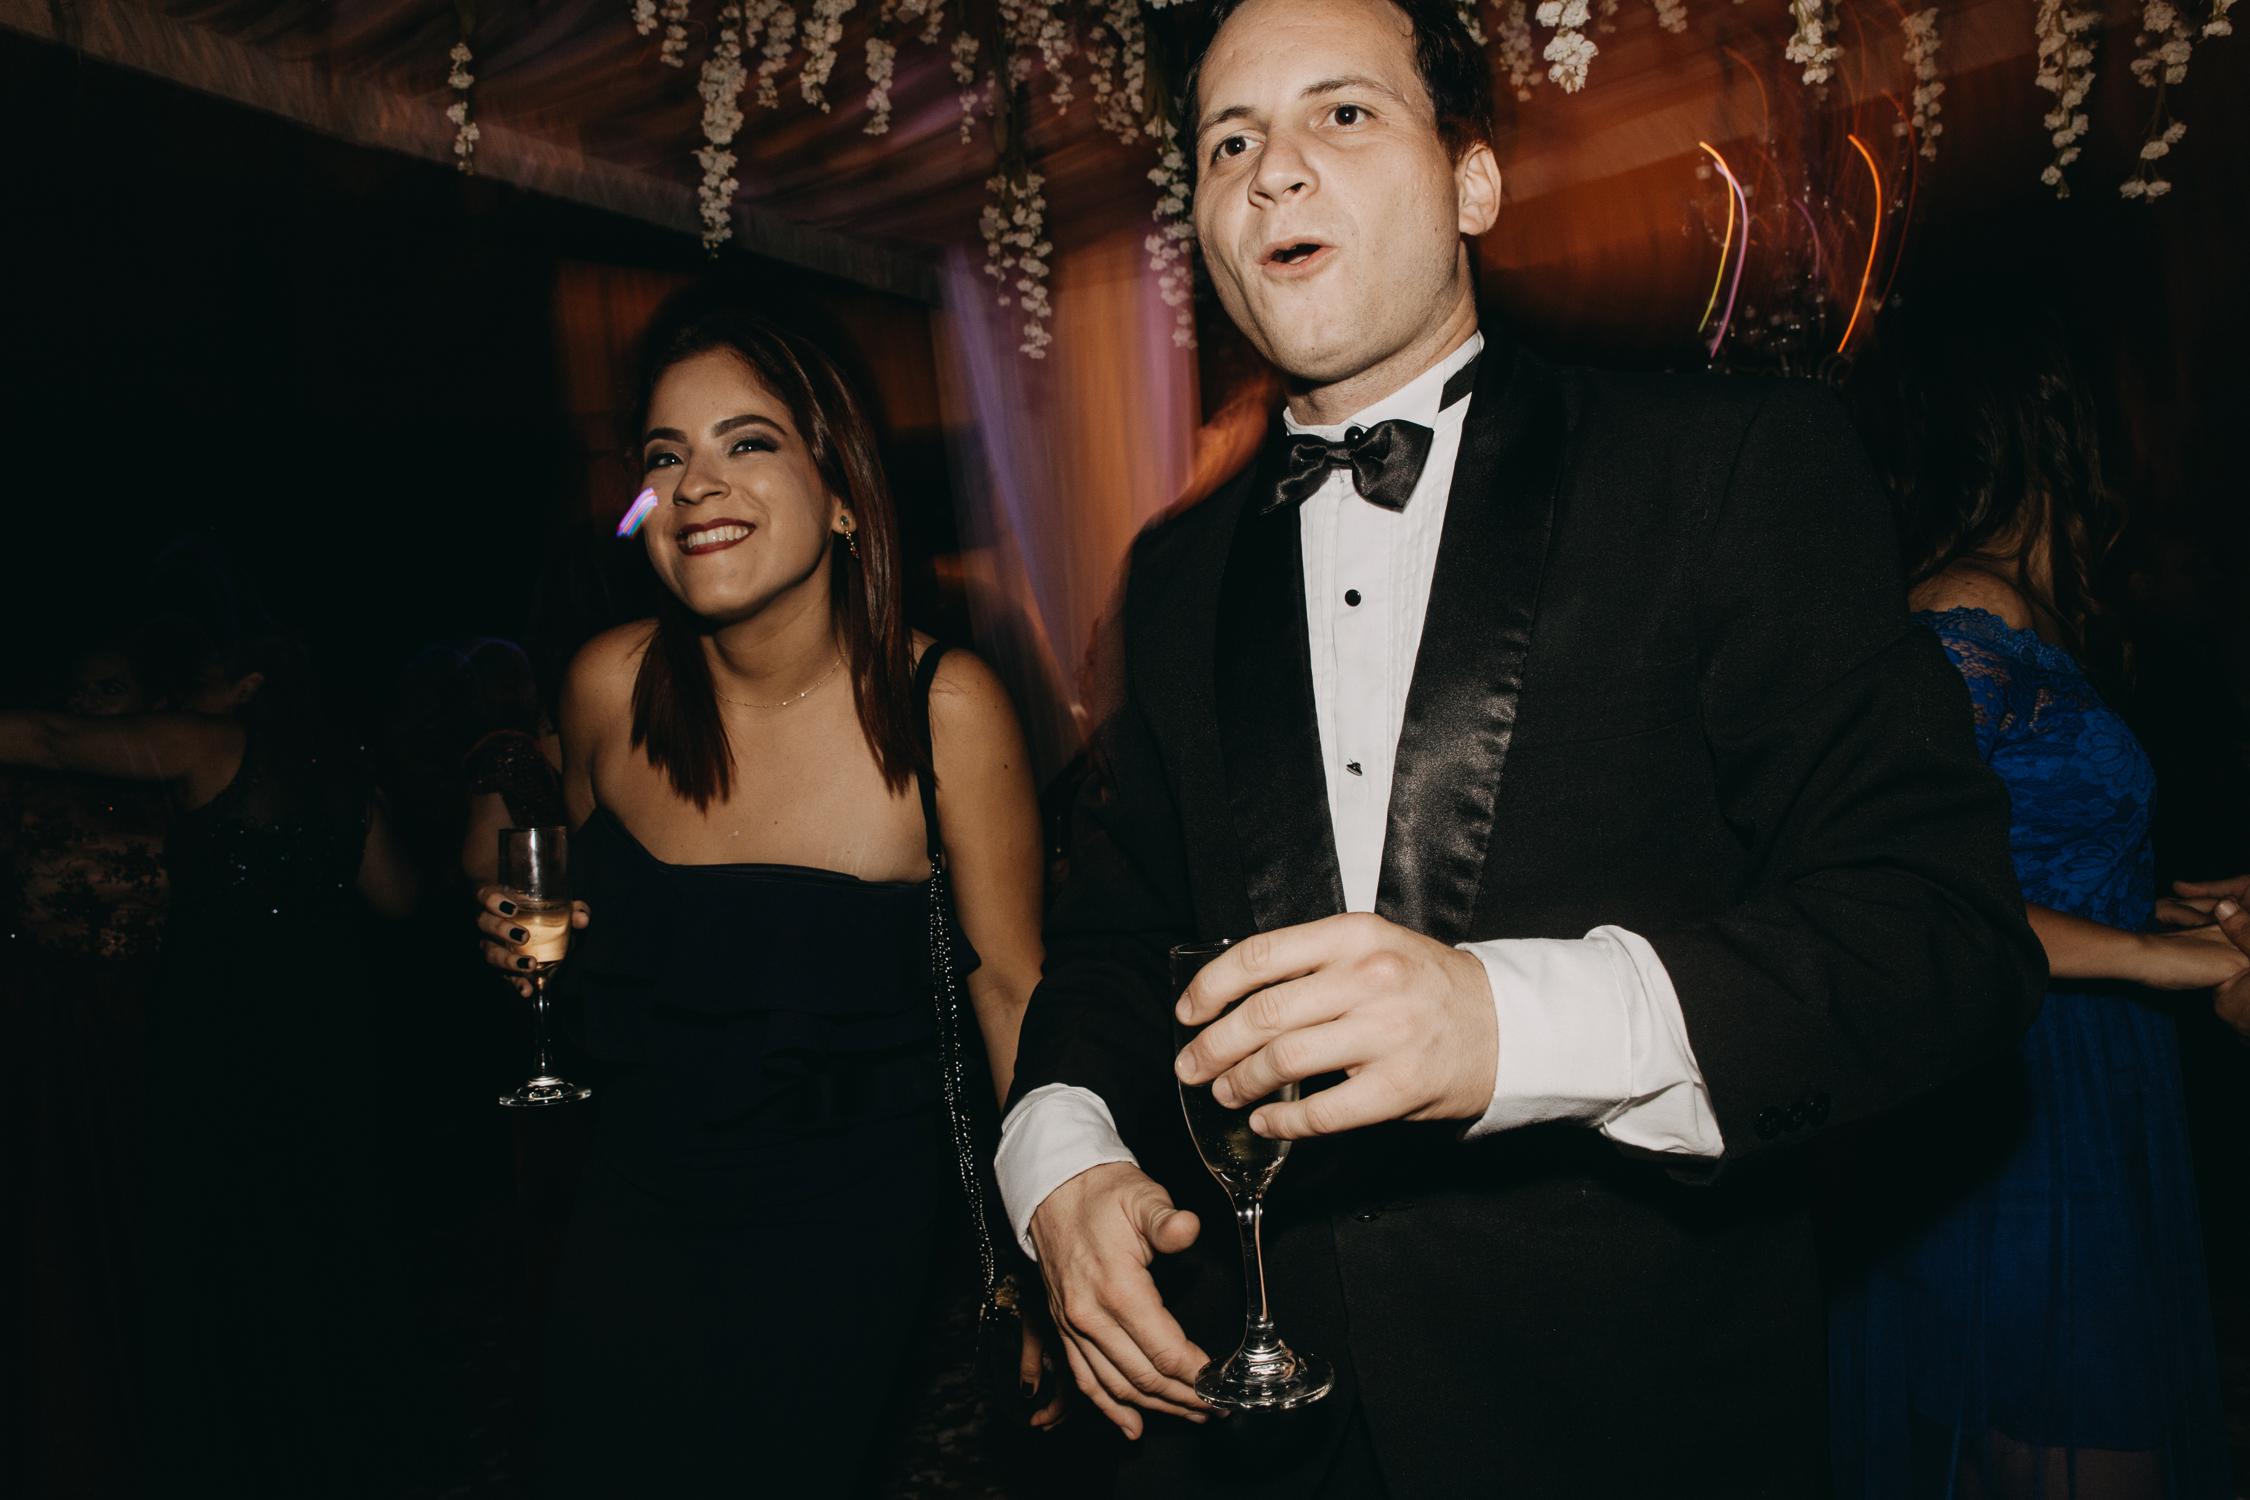 Michelle-Agurto-Fotografia-Bodas-Ecuador-Destination-Wedding-Photographer-Vicky-Javier-232.JPG